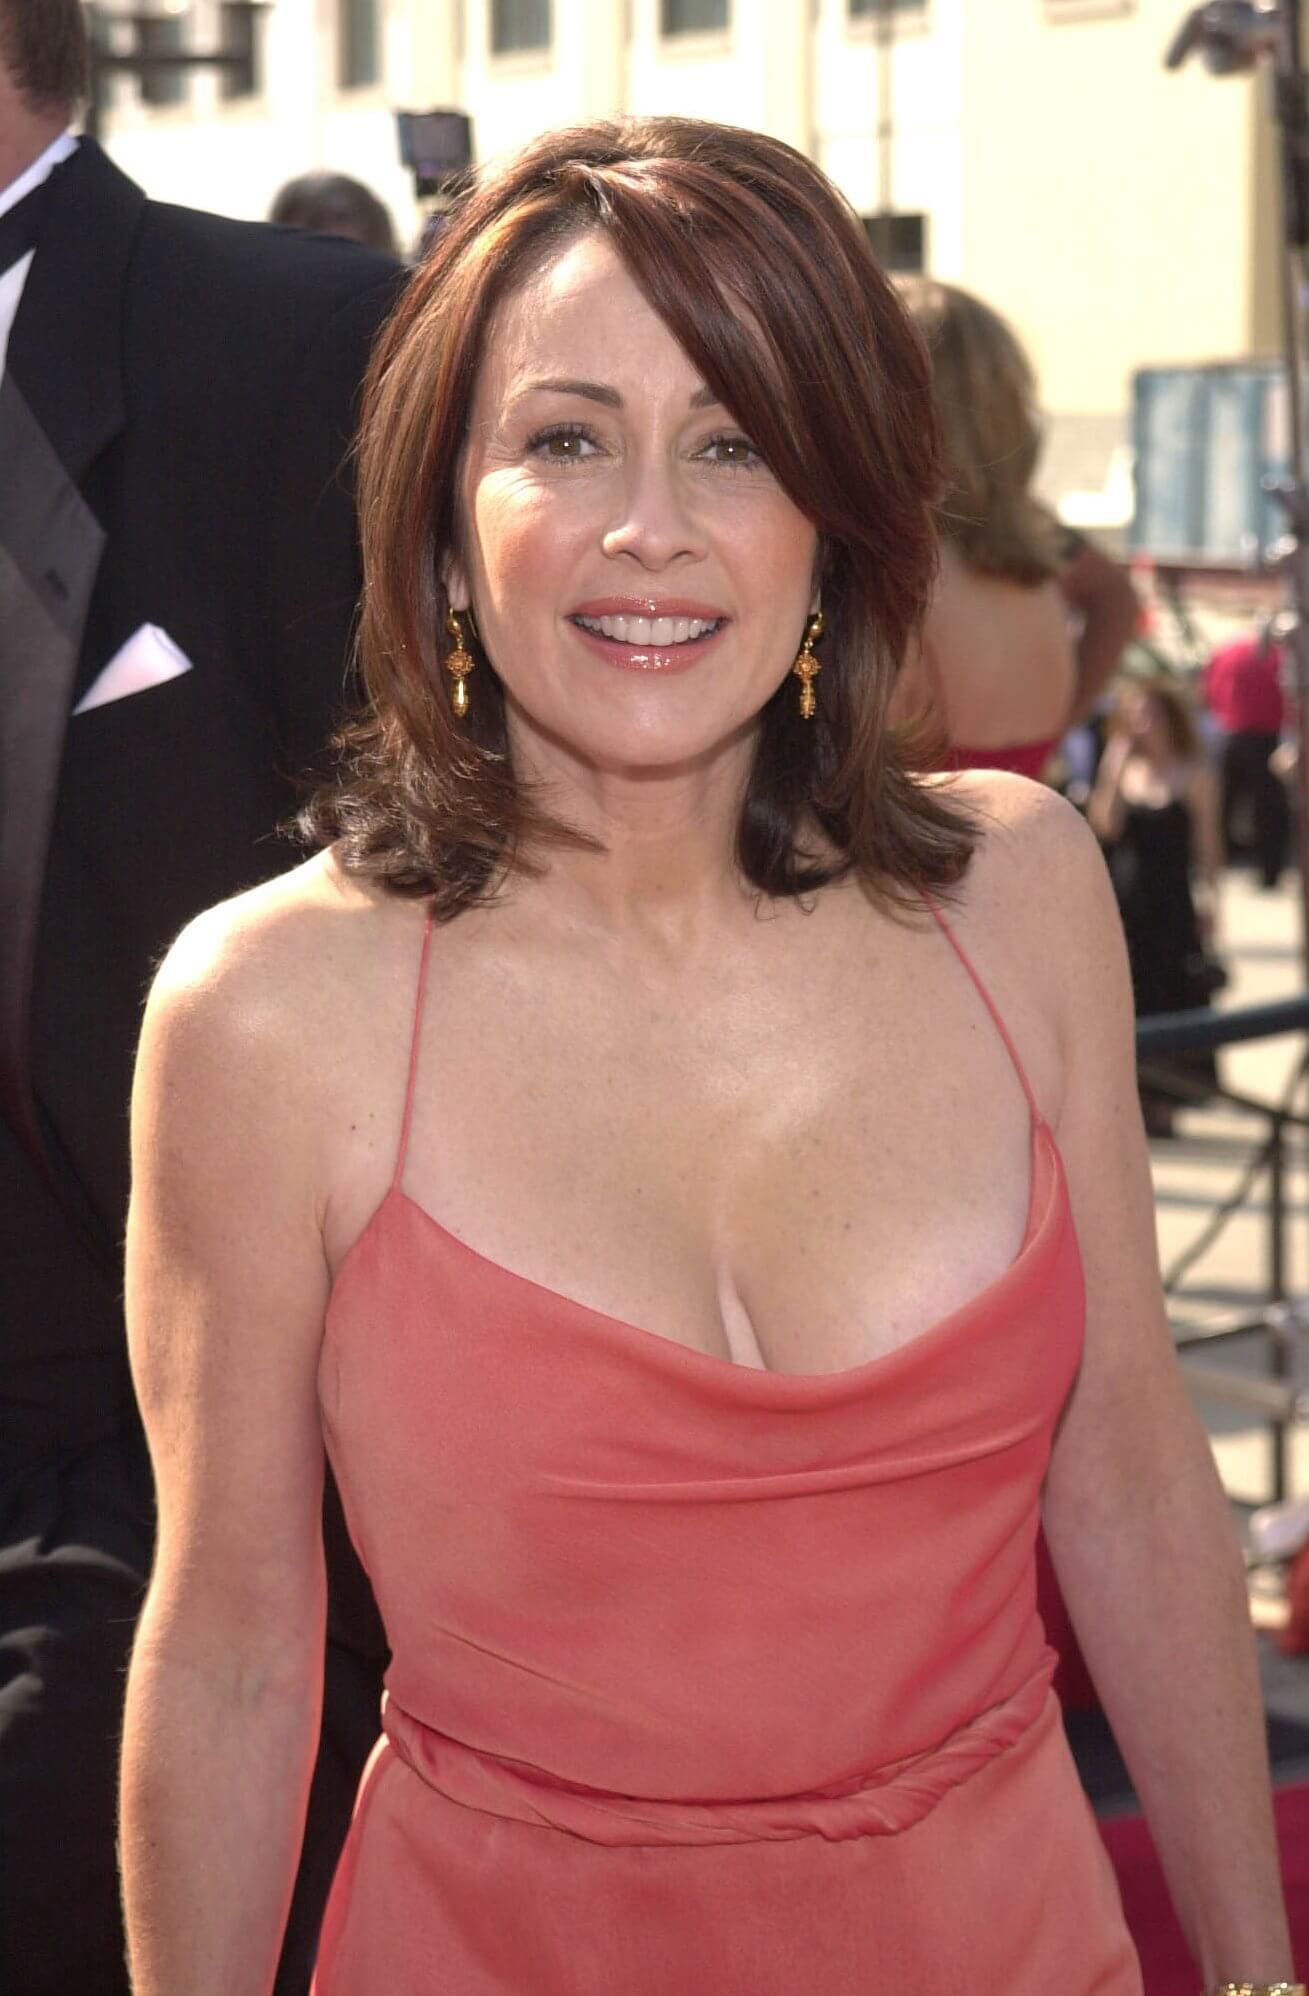 Patricia Heaton boobs